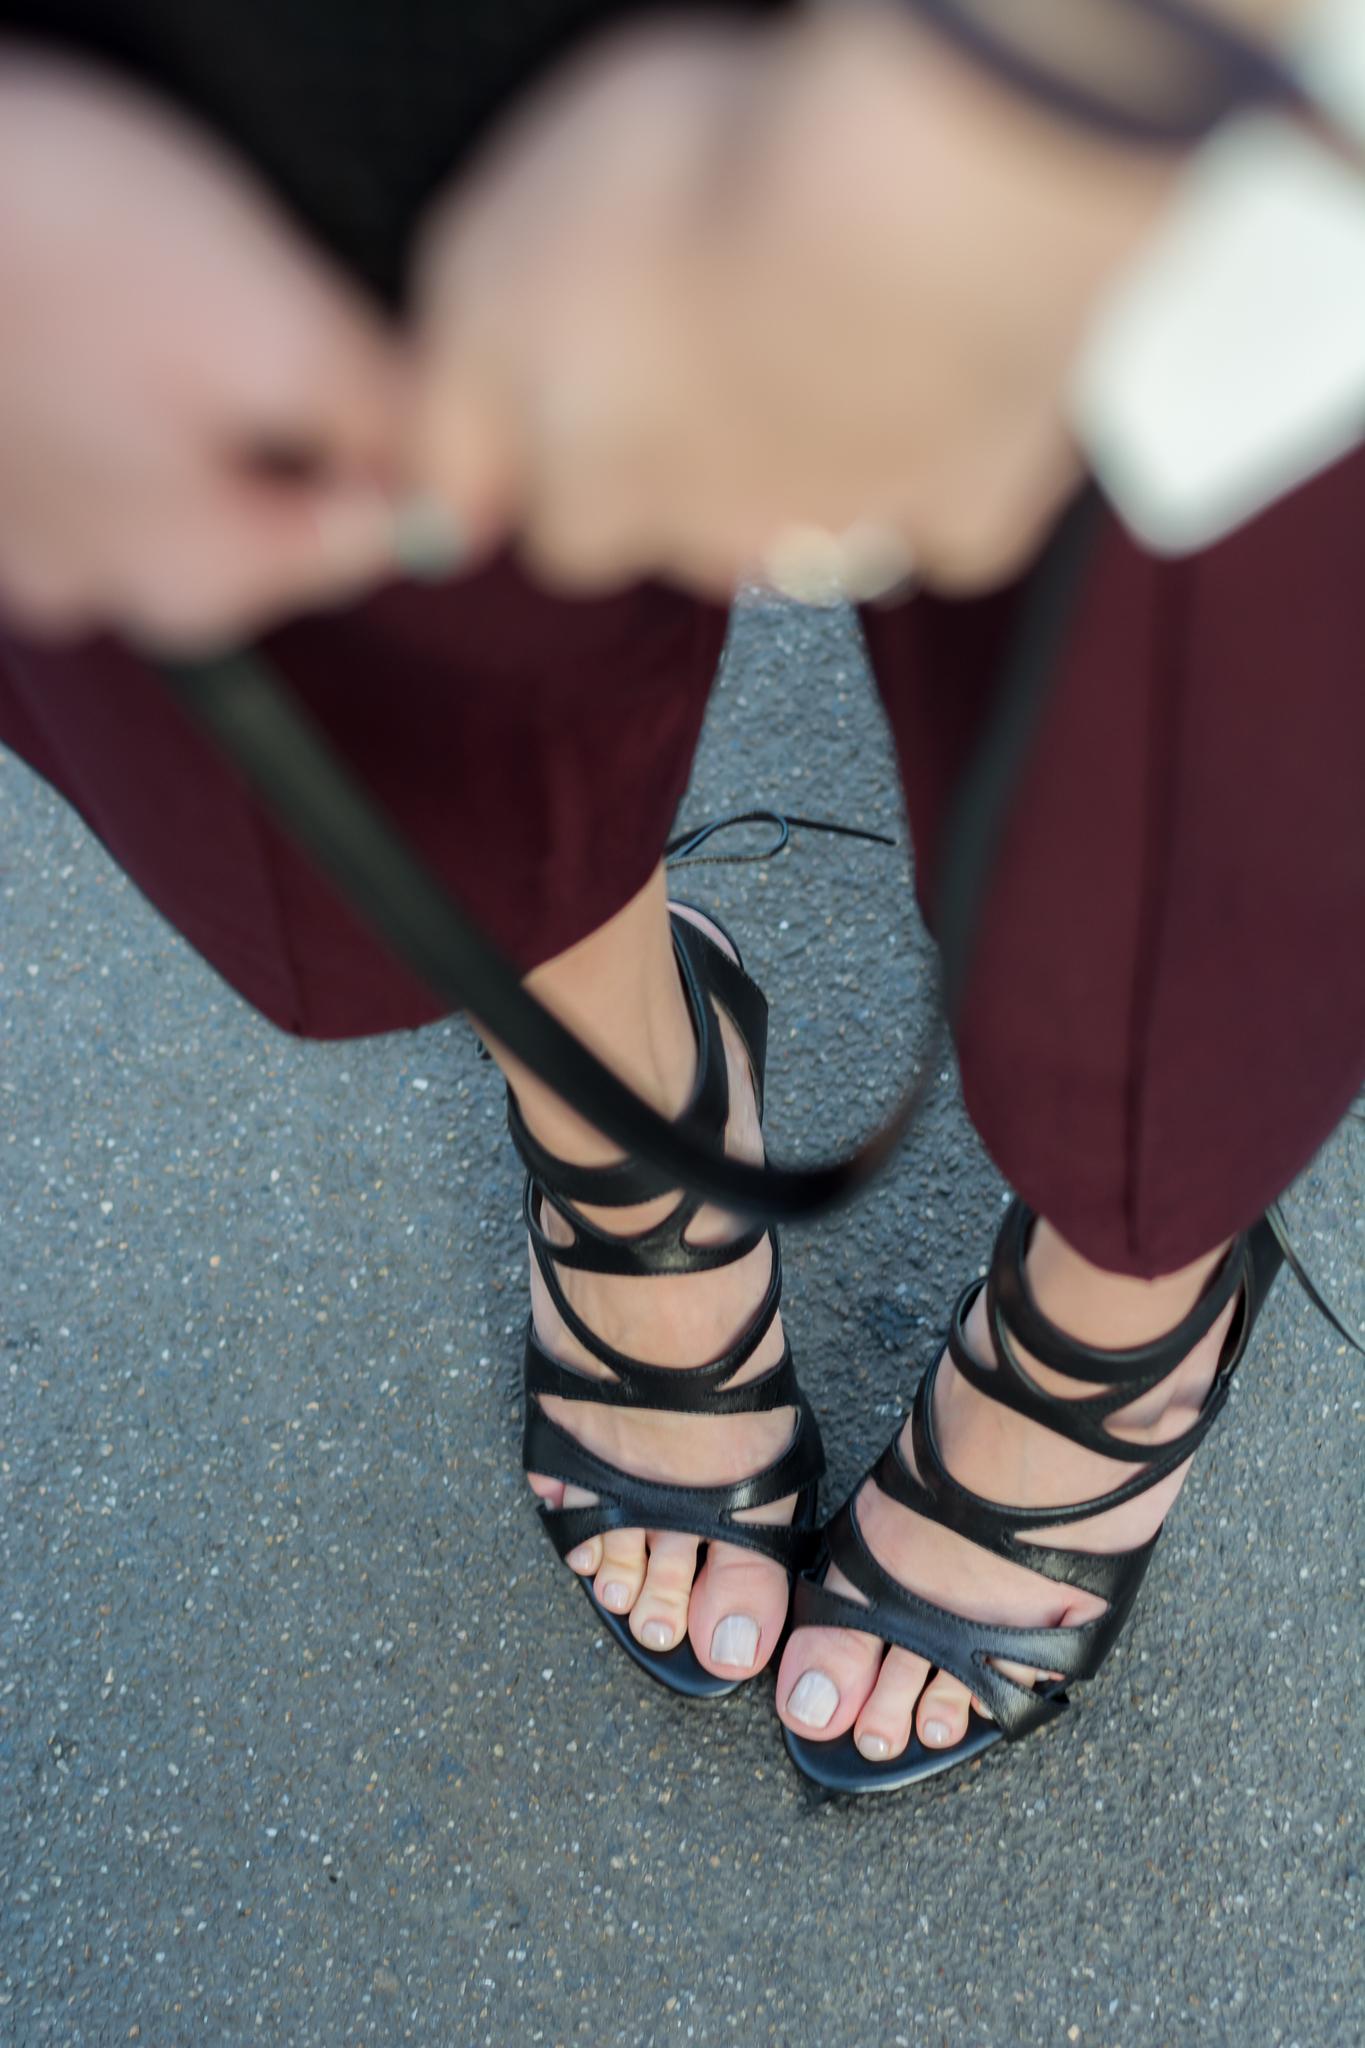 Burgundy Culottes   Poi Lei Shoes   Lavish Alice Cape Blaze   Lisa Fiege